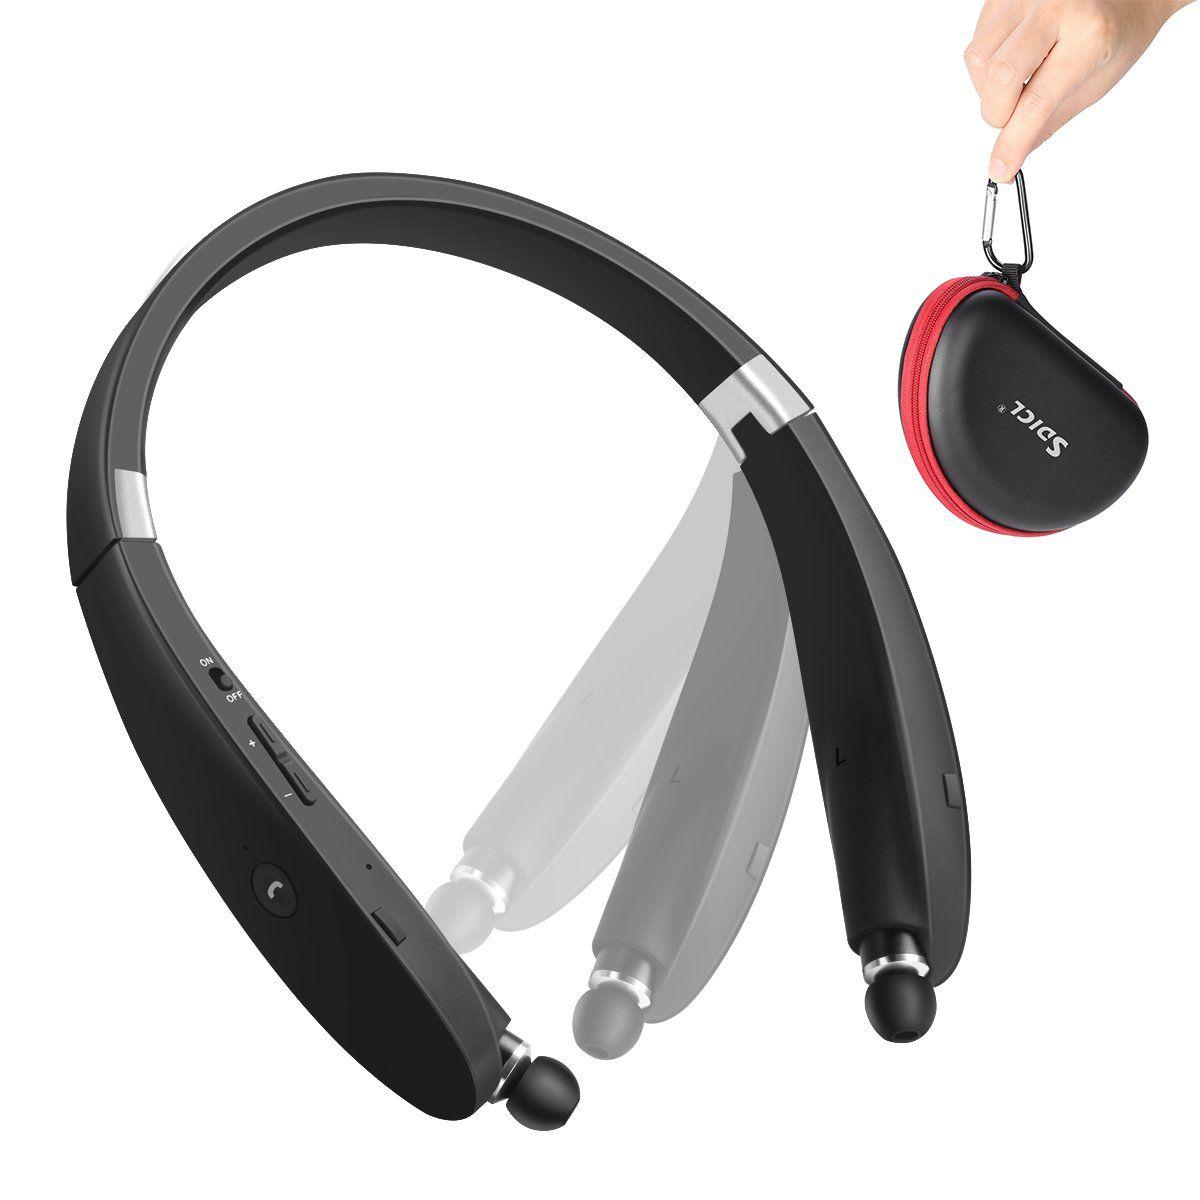 Bluetooth headset sdicl wireless stereo headphones neckband with bluetooth headset sdicl wireless stereo headphones neckband with foldable and retractable earbuds 991 black malvernweather Choice Image